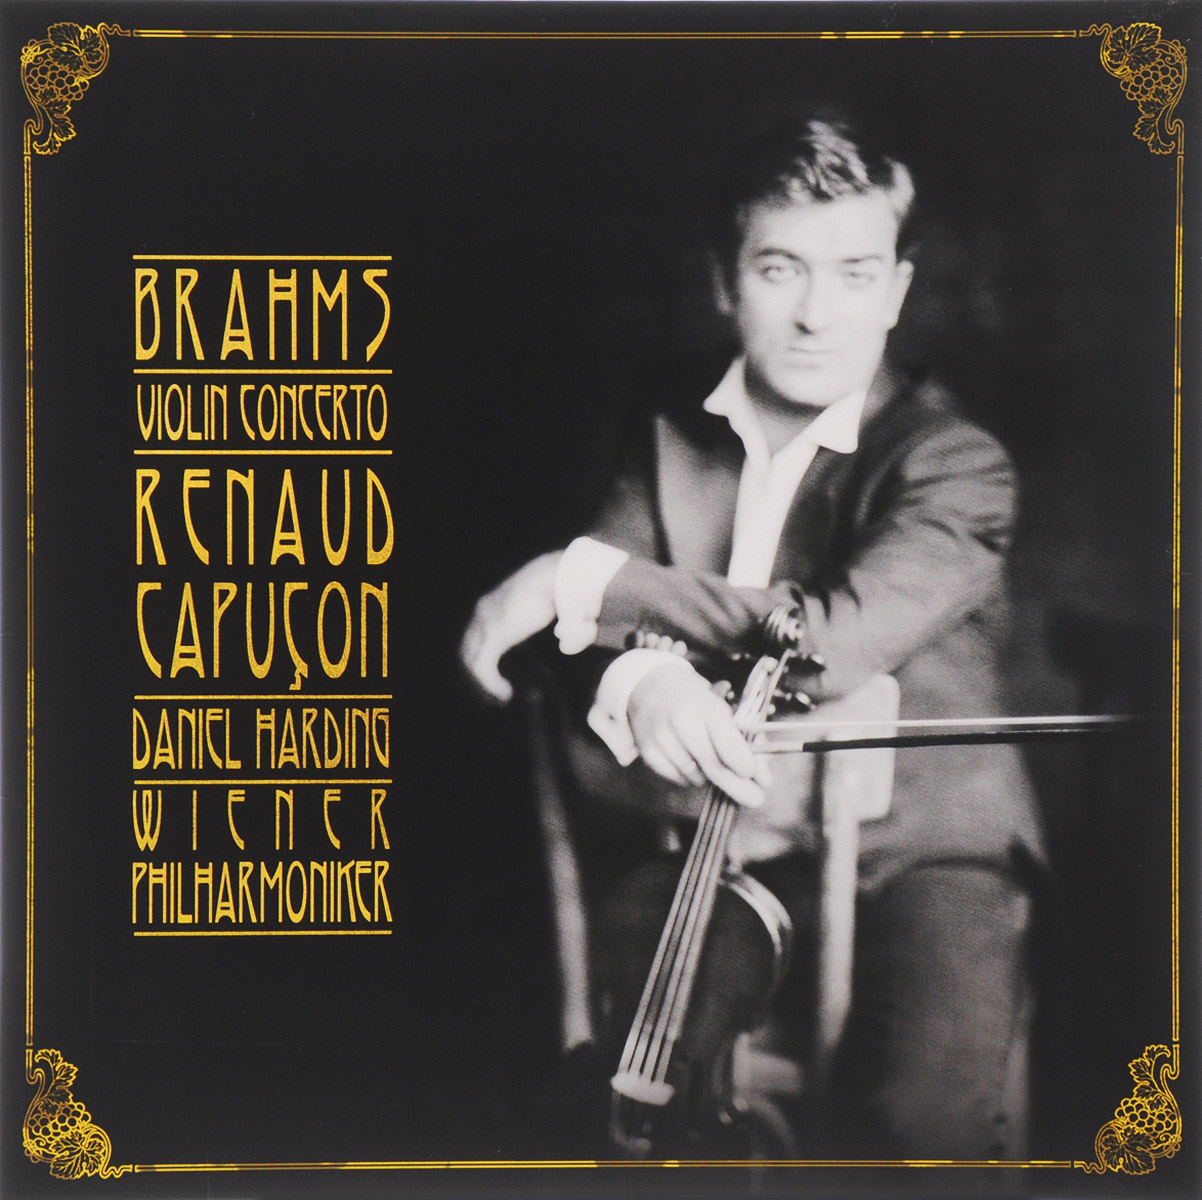 лучшая цена Рено Капукон Renaud Capucon. Daniel Harding. Brahms. Violin Concerto (LP)